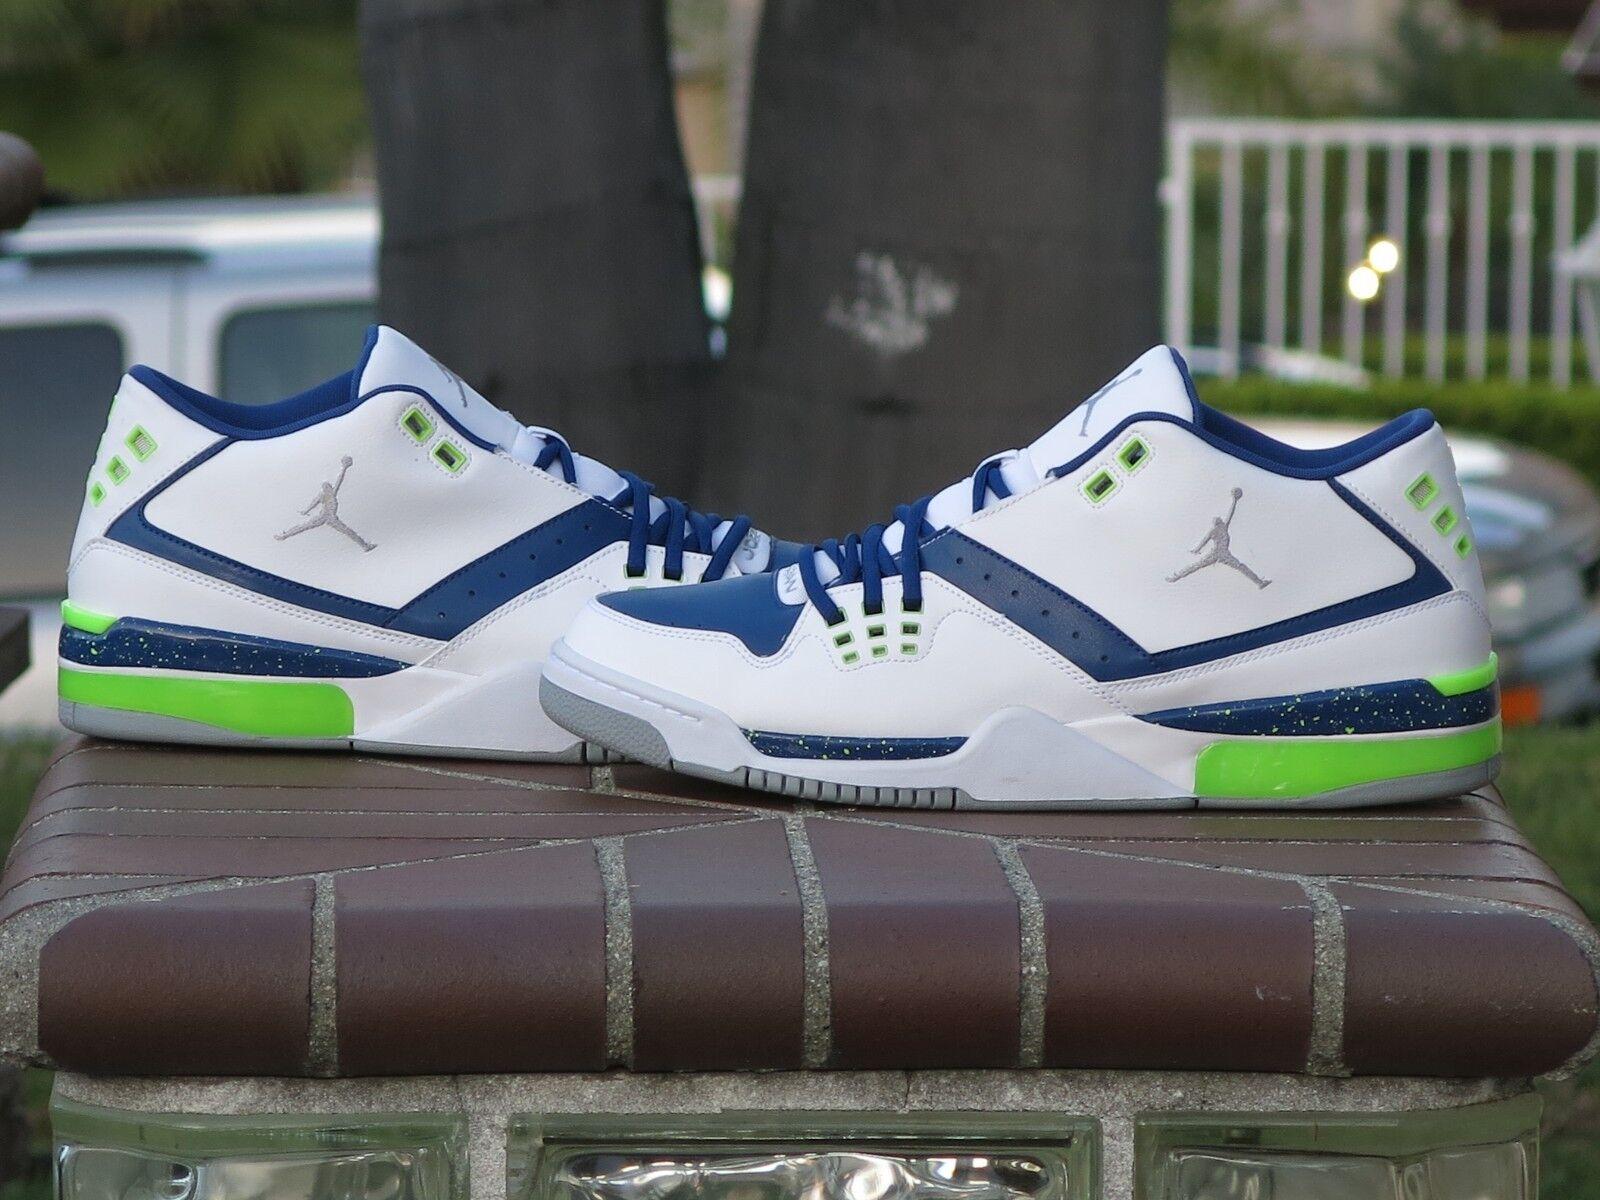 Nike - air jordan flug 23  - Nike basketball - schuhe 317820-118 sz. 144892